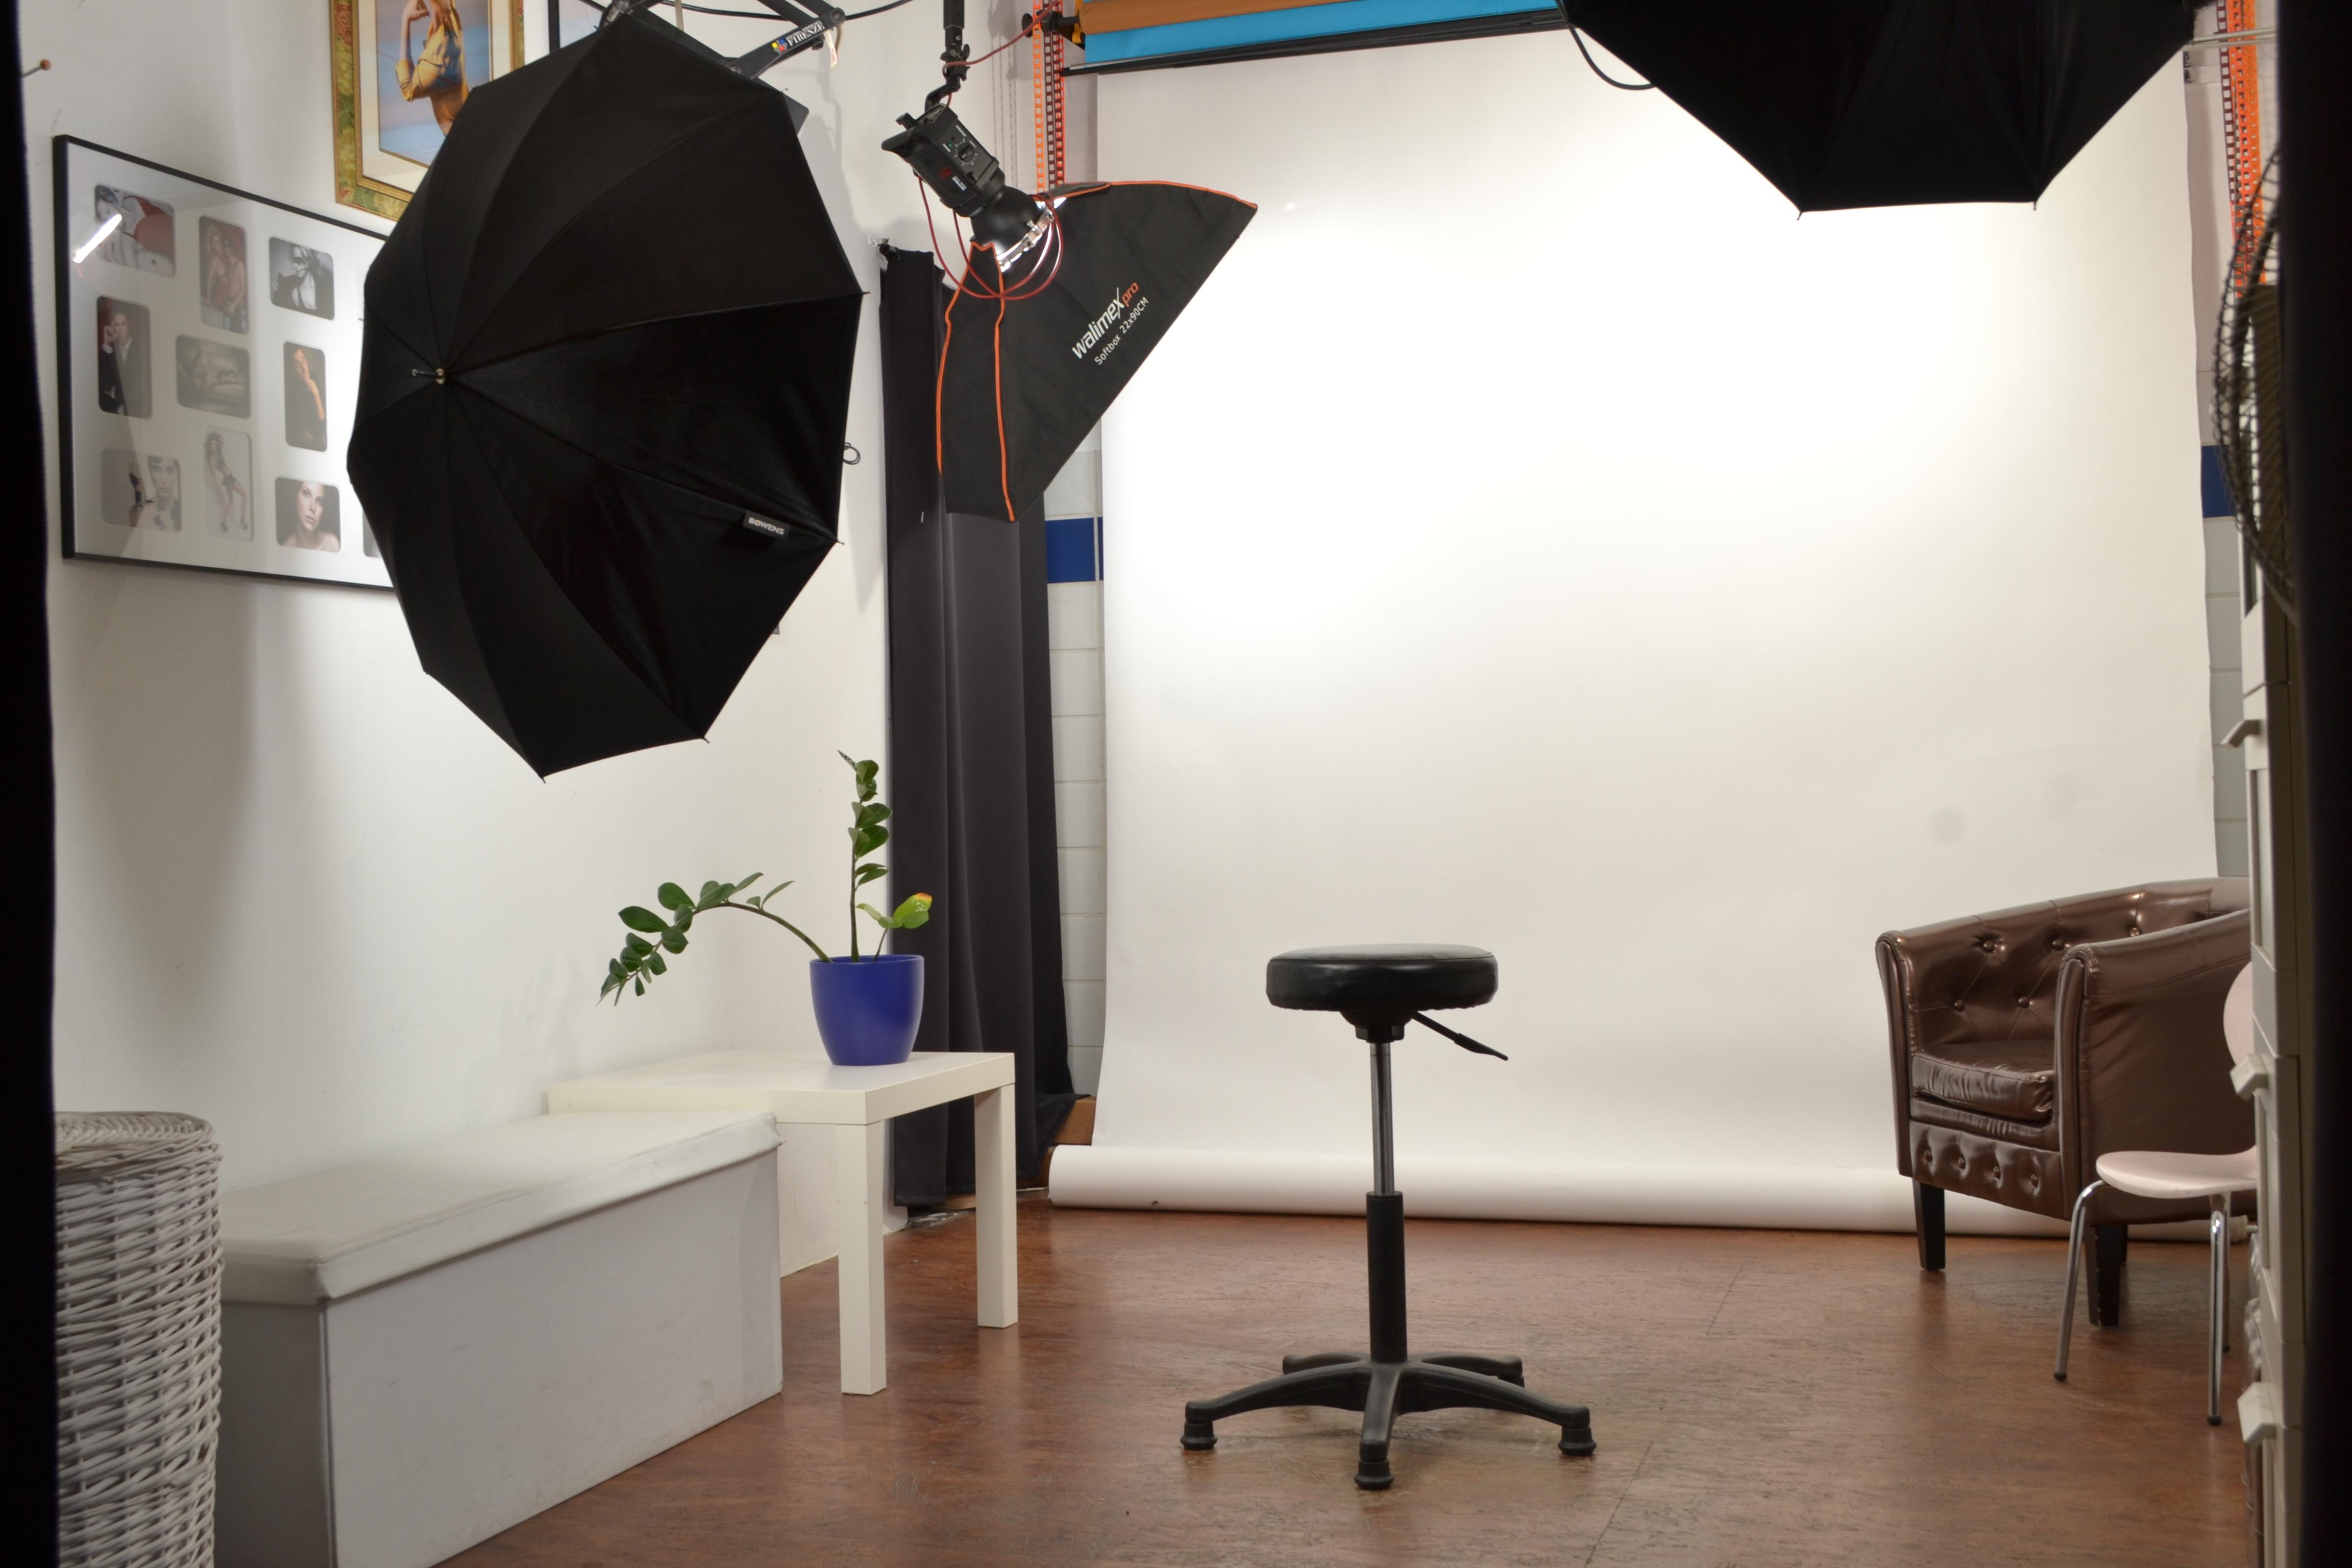 Fotostudio Berlin Mitte, Biometrische Passbilder, Bewerbungsbild